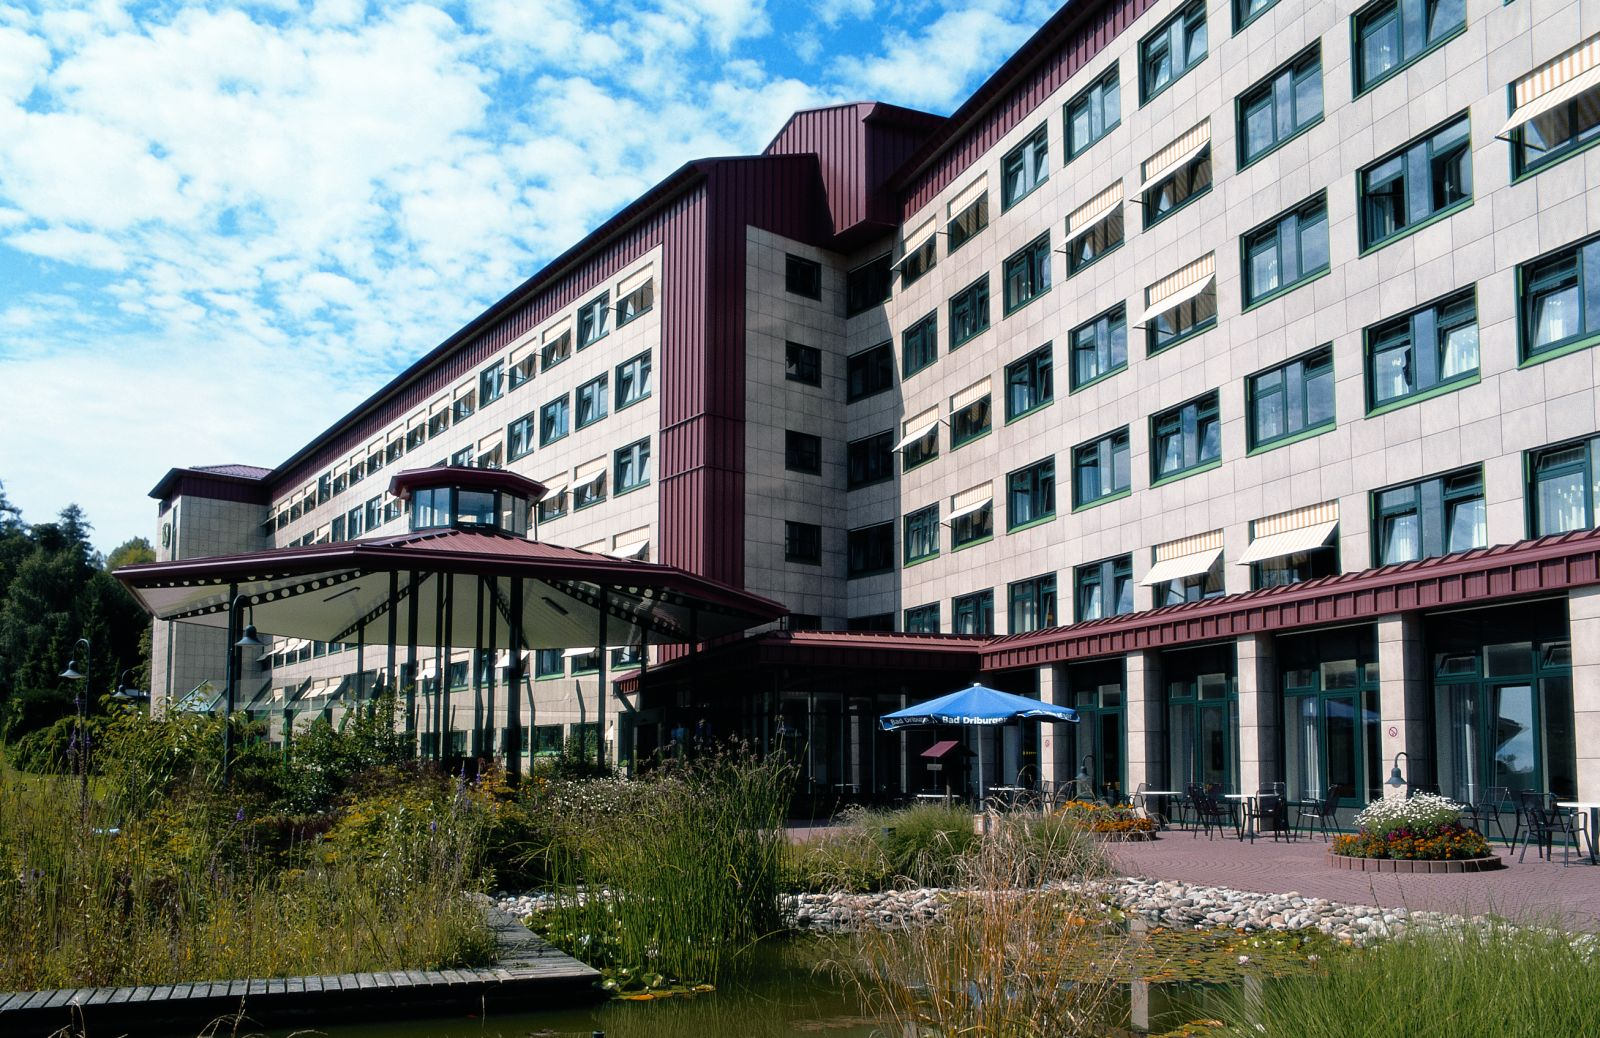 Rosenberg bad driburg klinik Caspar Heinrich